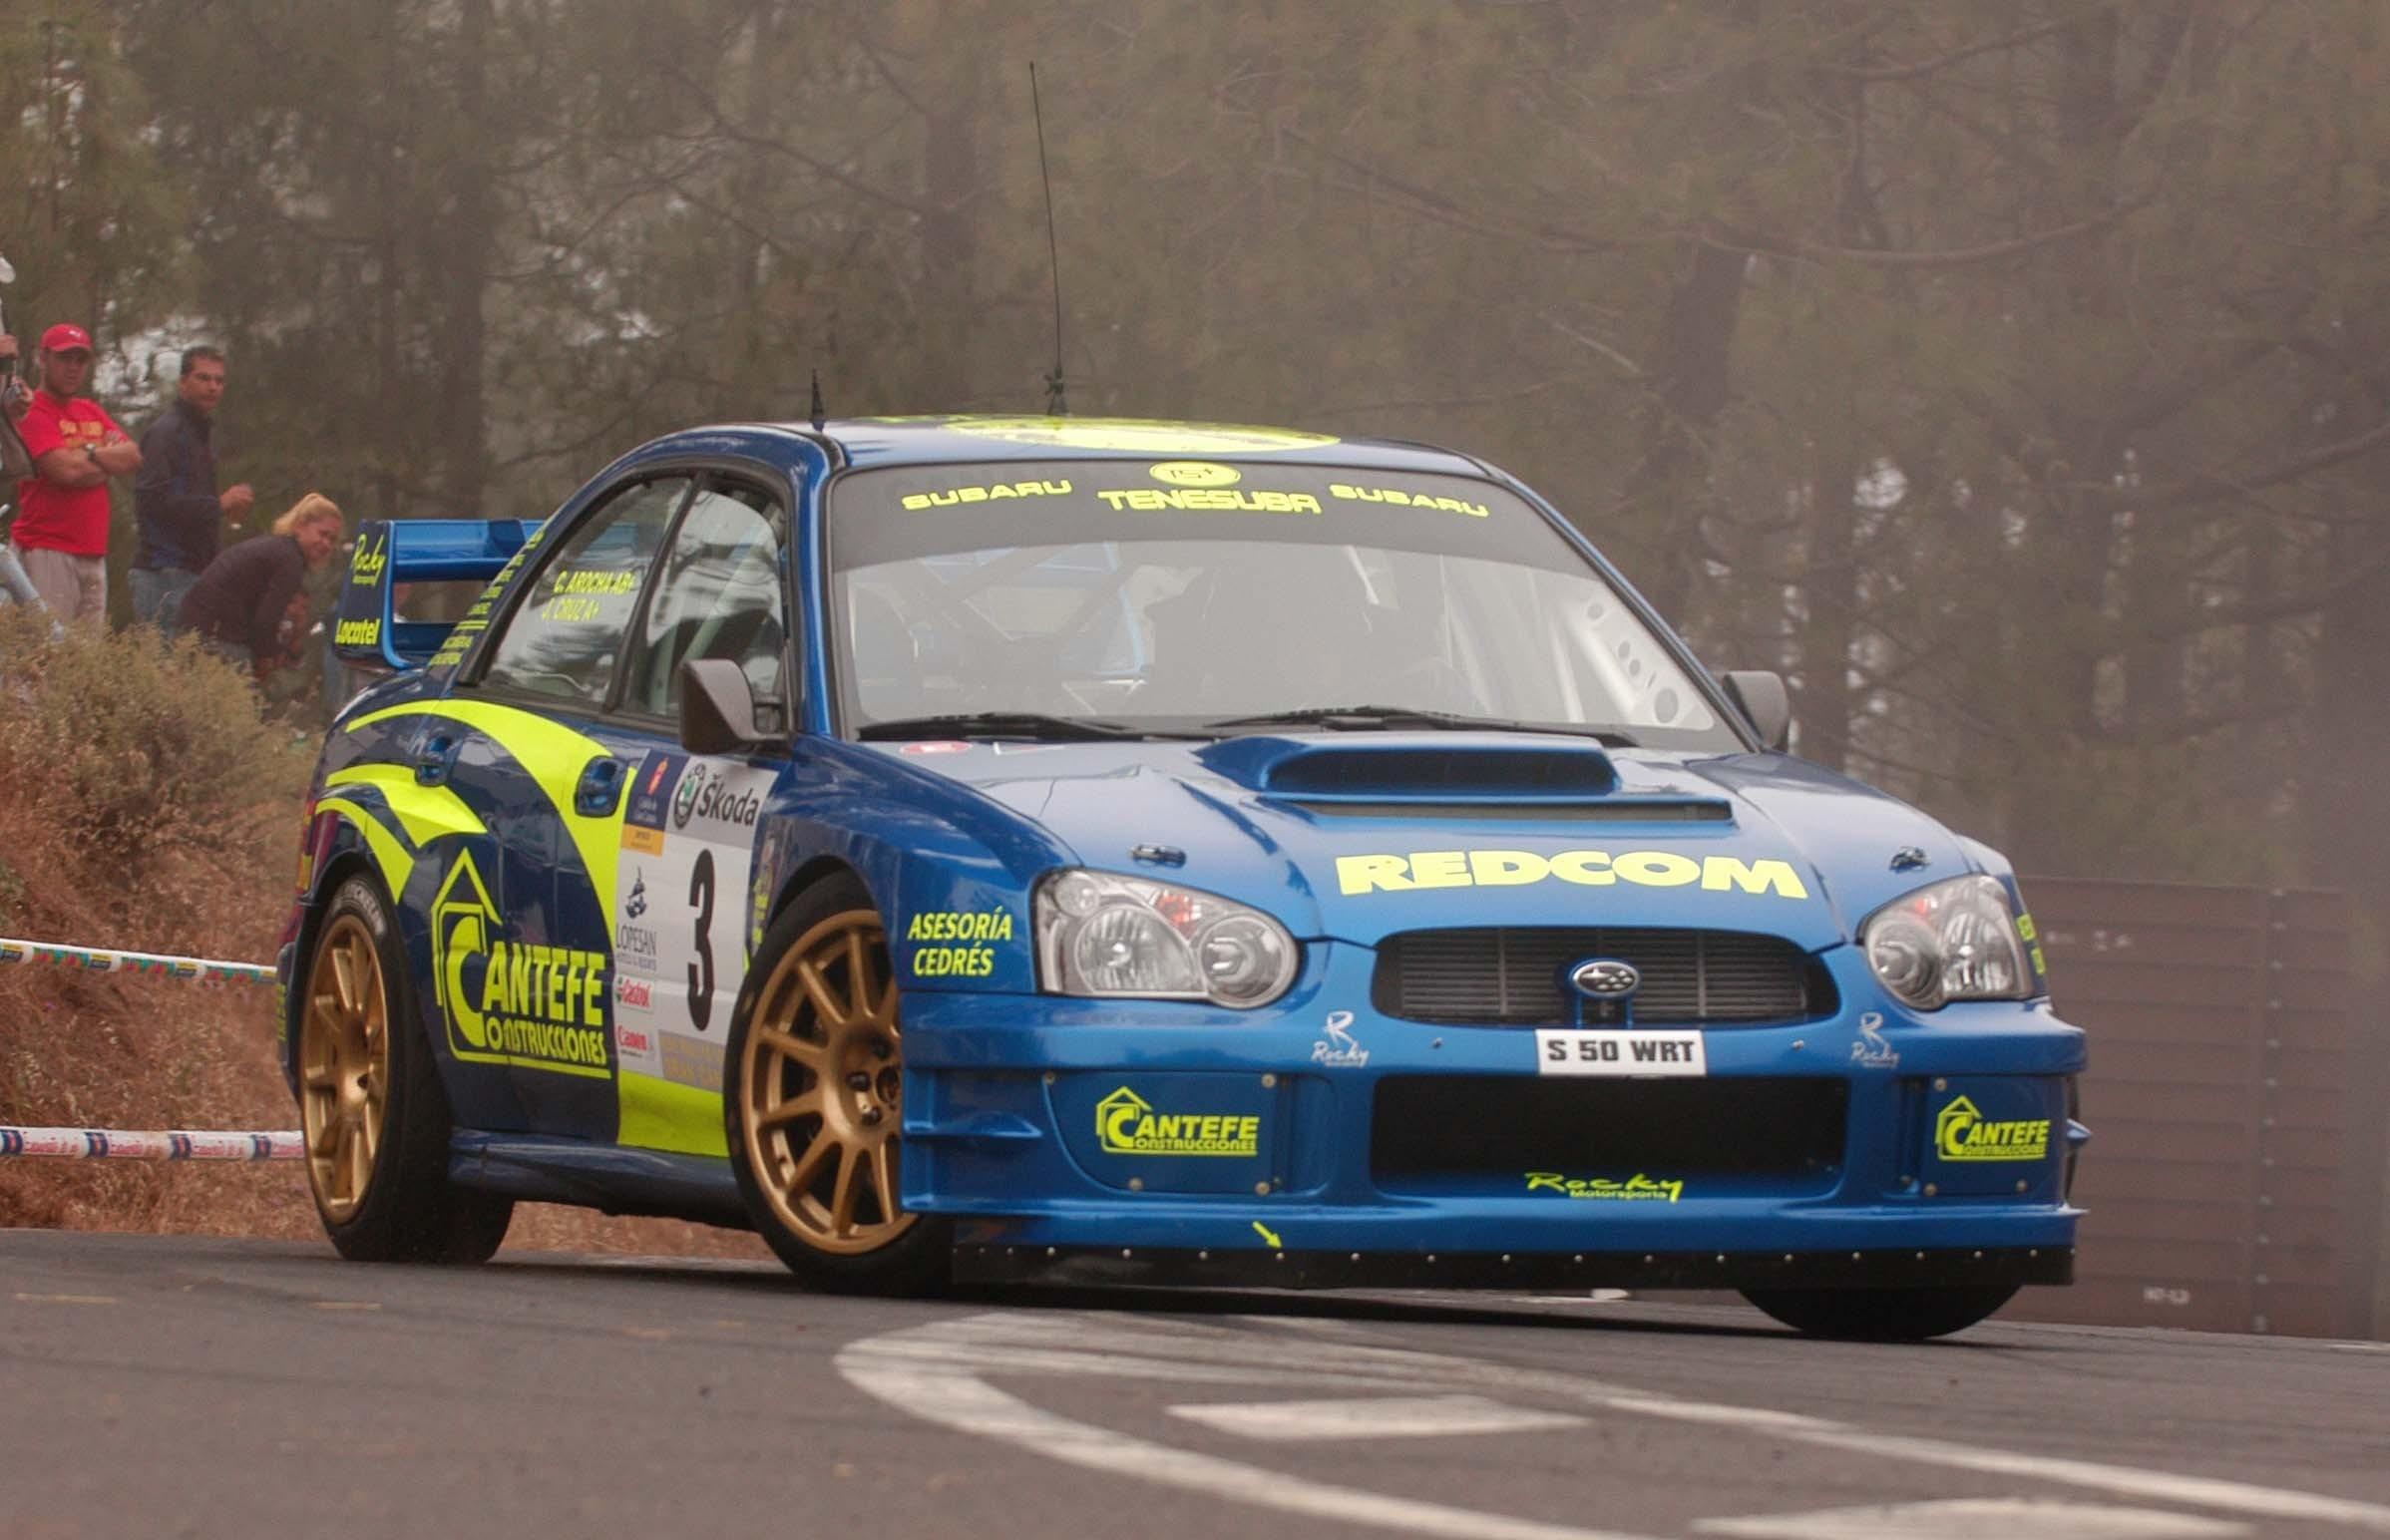 Subaru Rally Car Wallpaper 62 Images